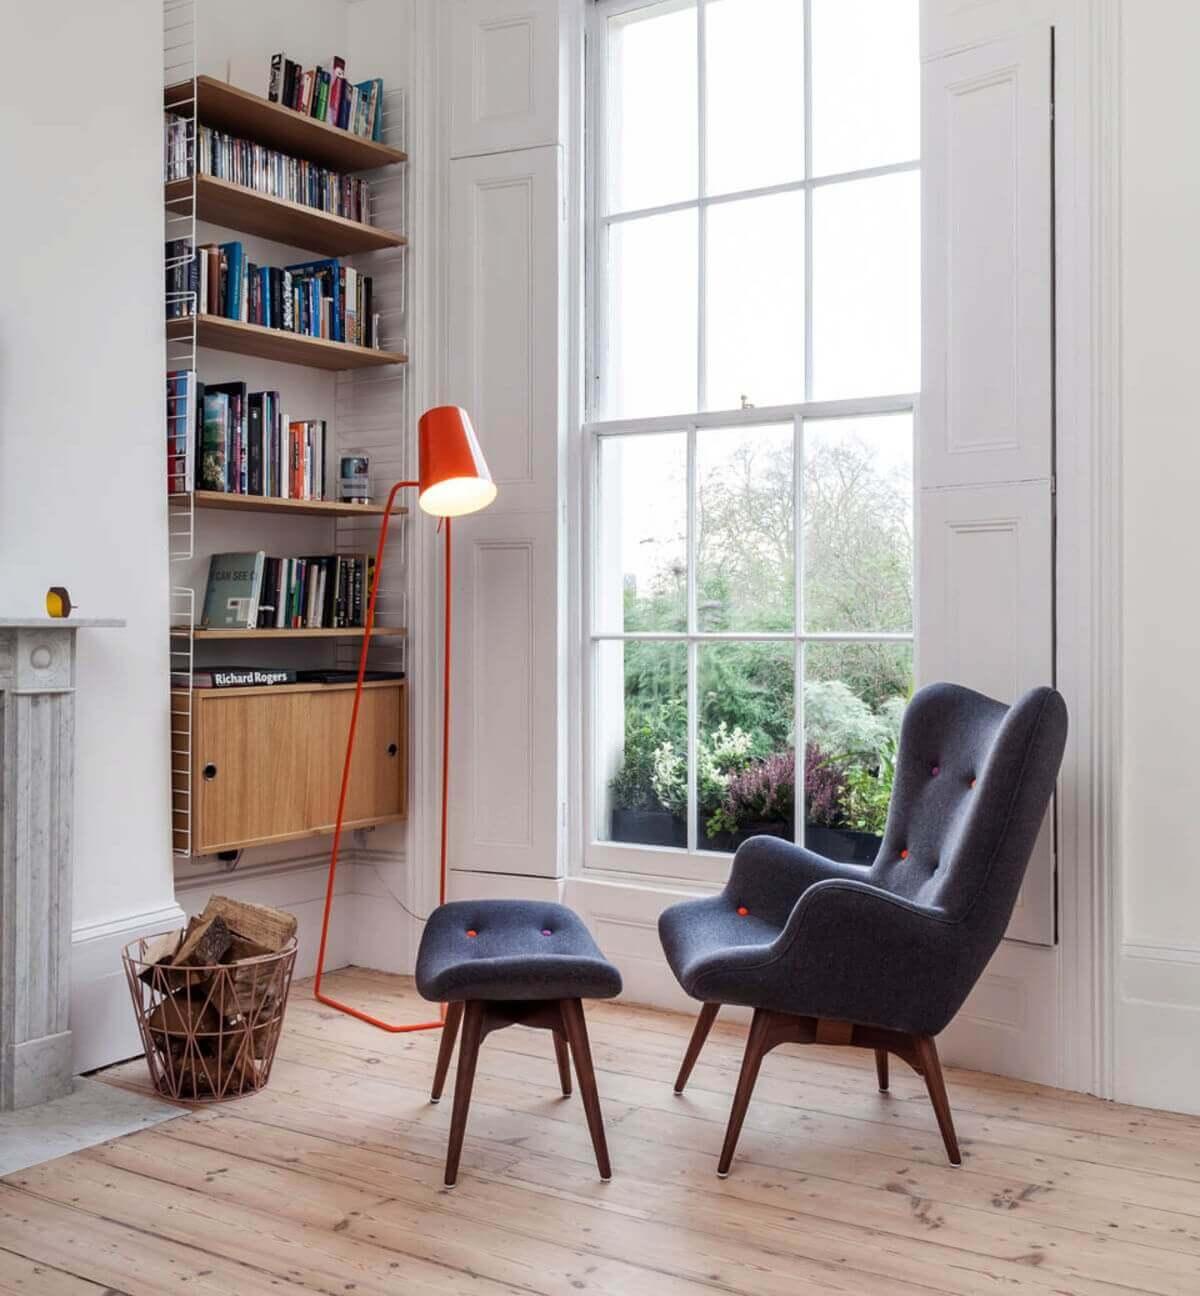 Cozy Reading Spot and Bookshelf